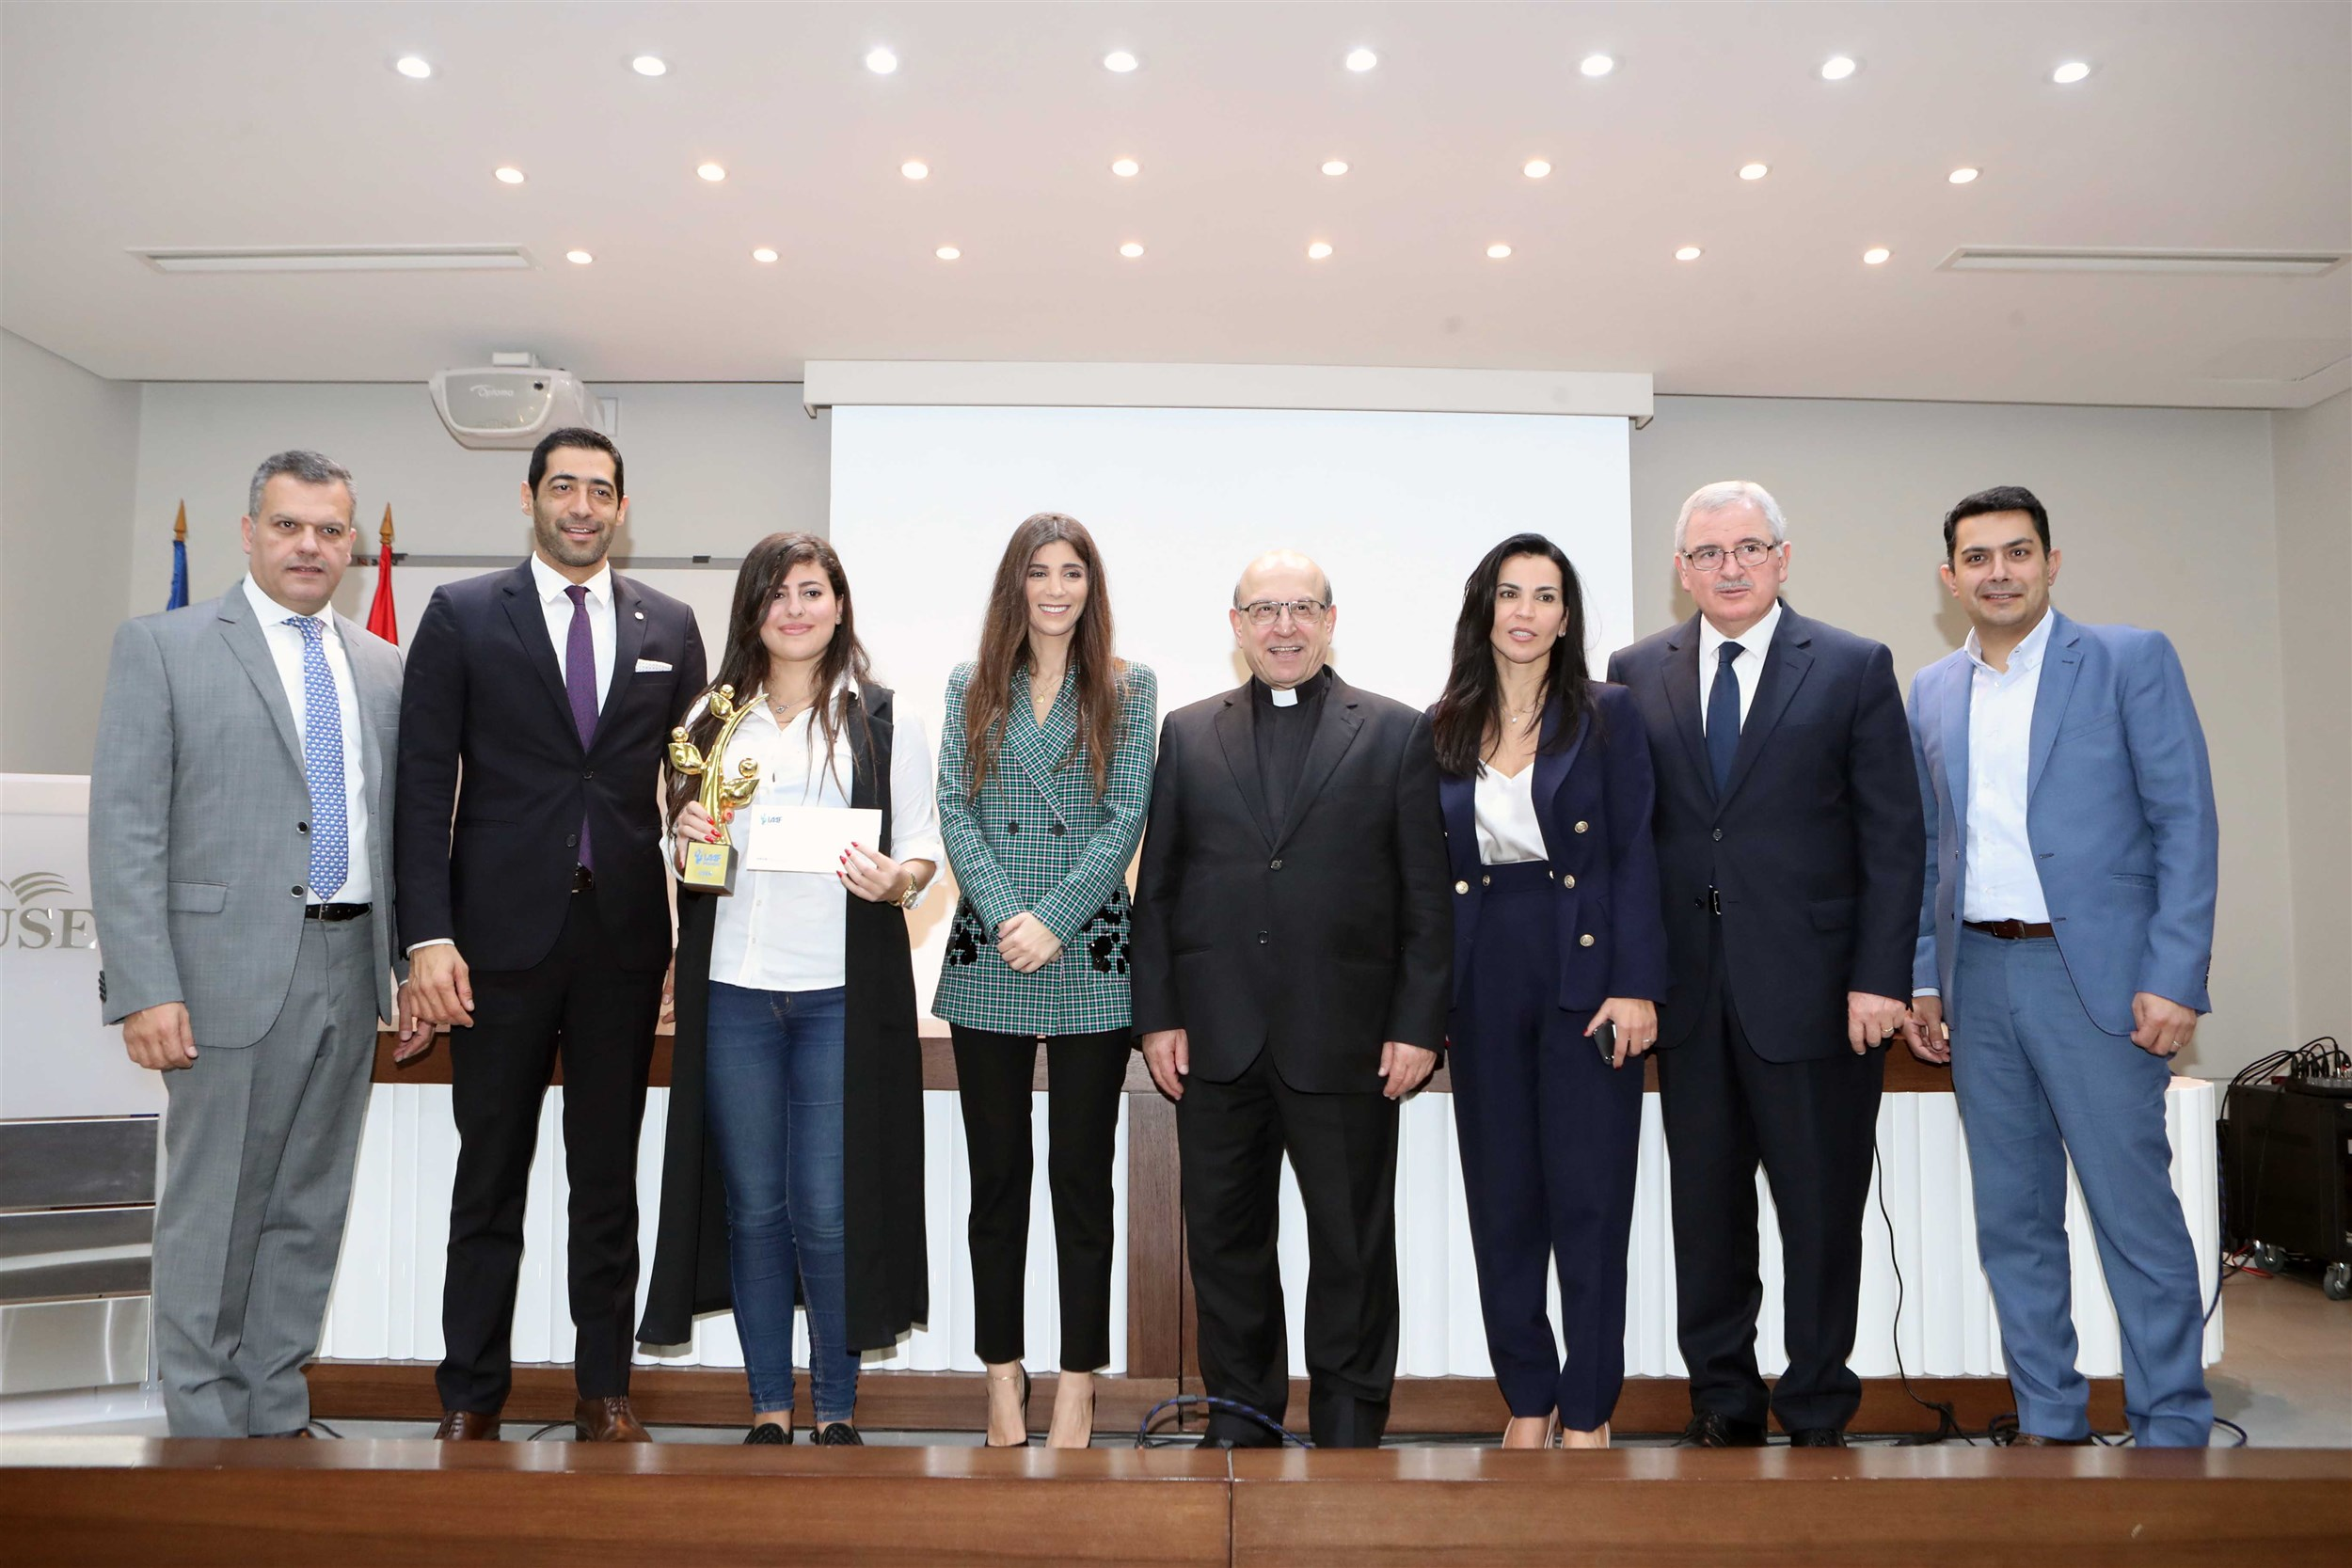 IAAF Awards - Holy Spirit University of Kaslik Event 2018